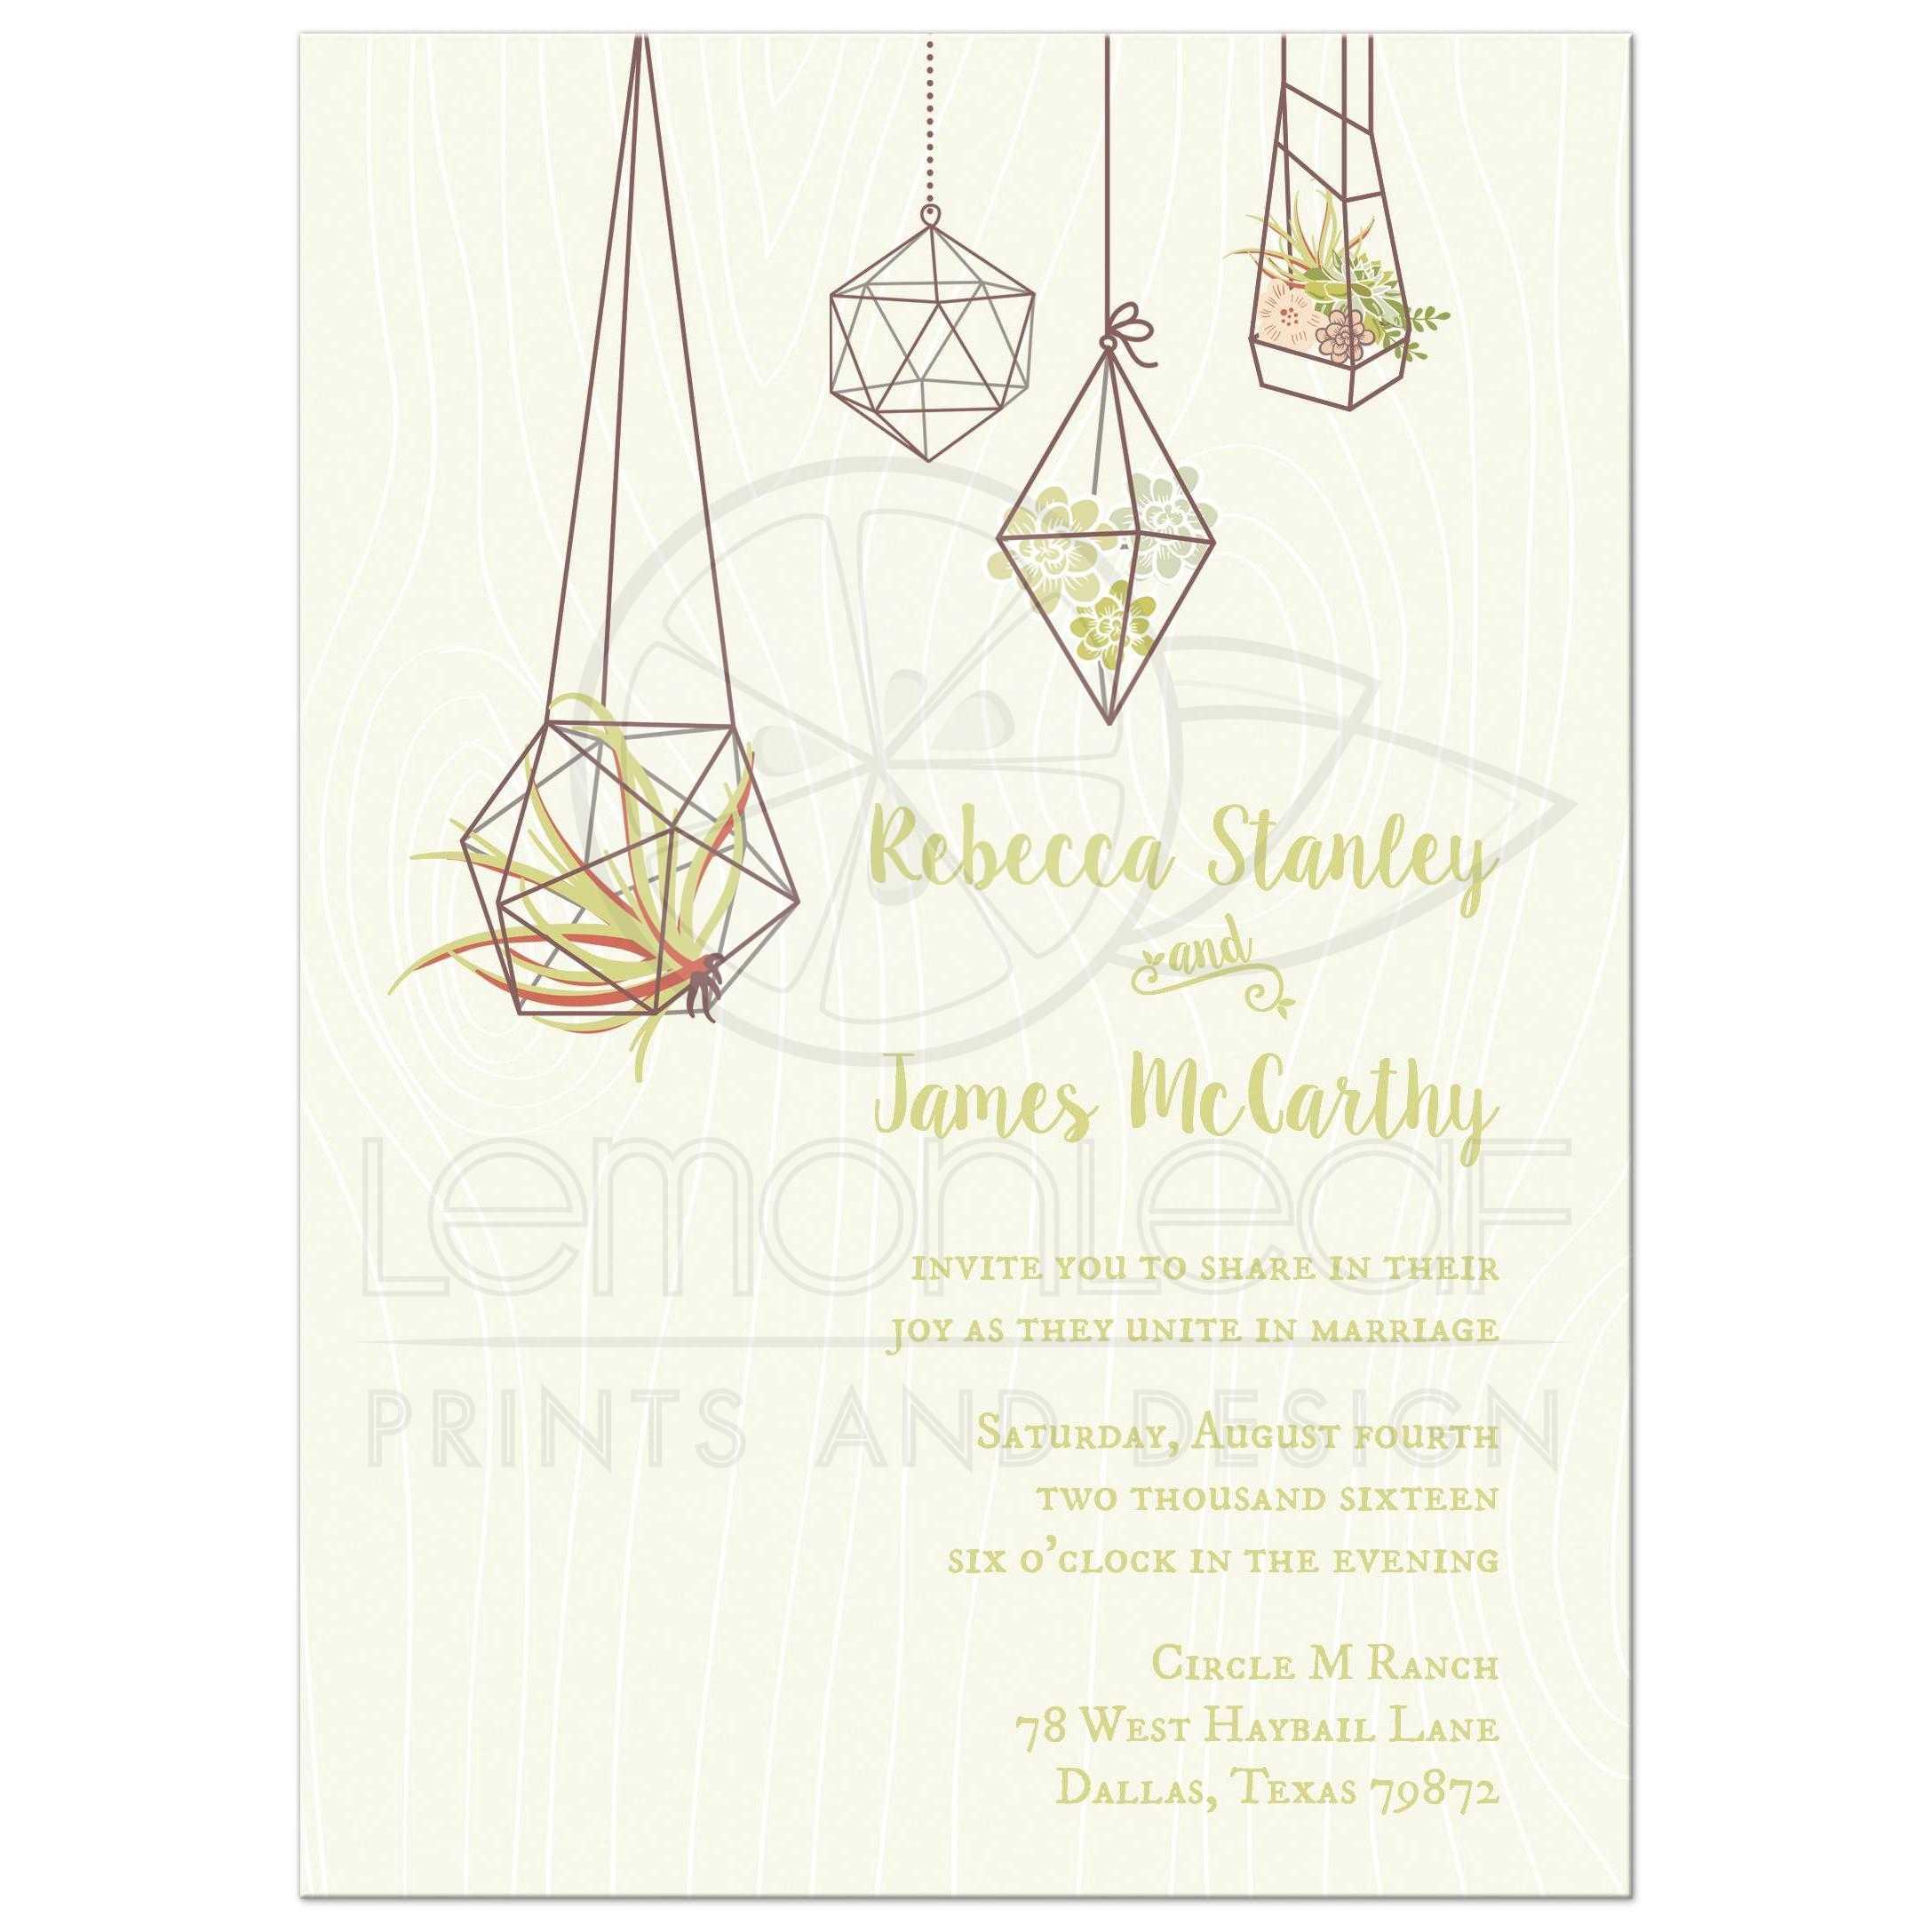 Wedding Invitation Hanging Air Plant and Succulents Terrariums